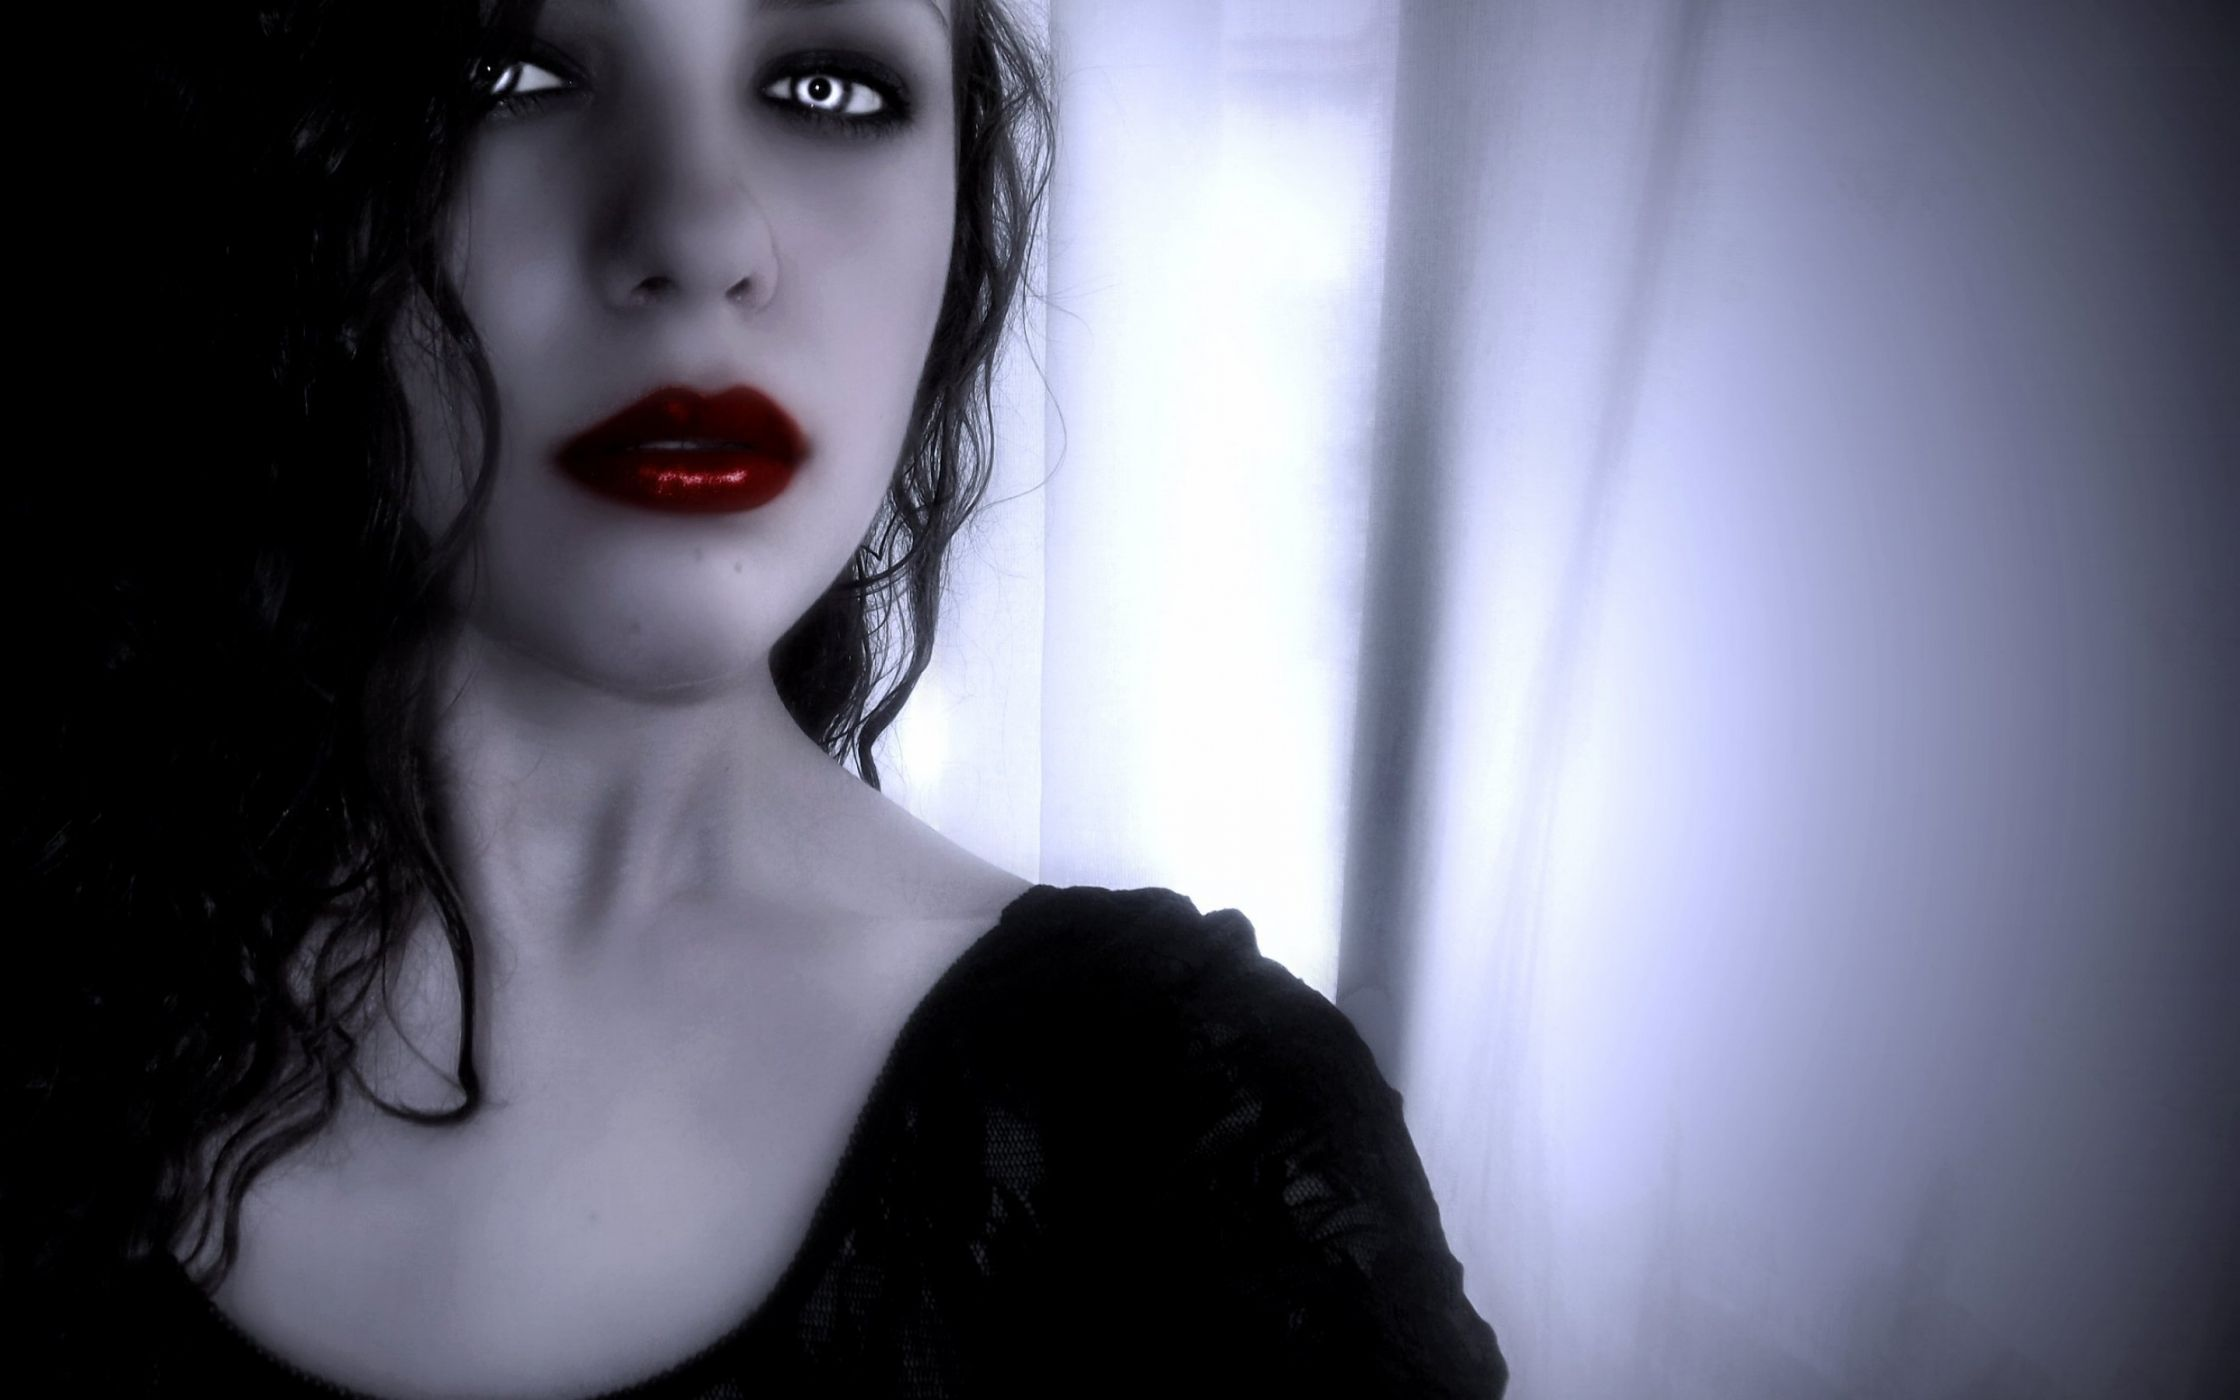 День матери, картинки вампирши